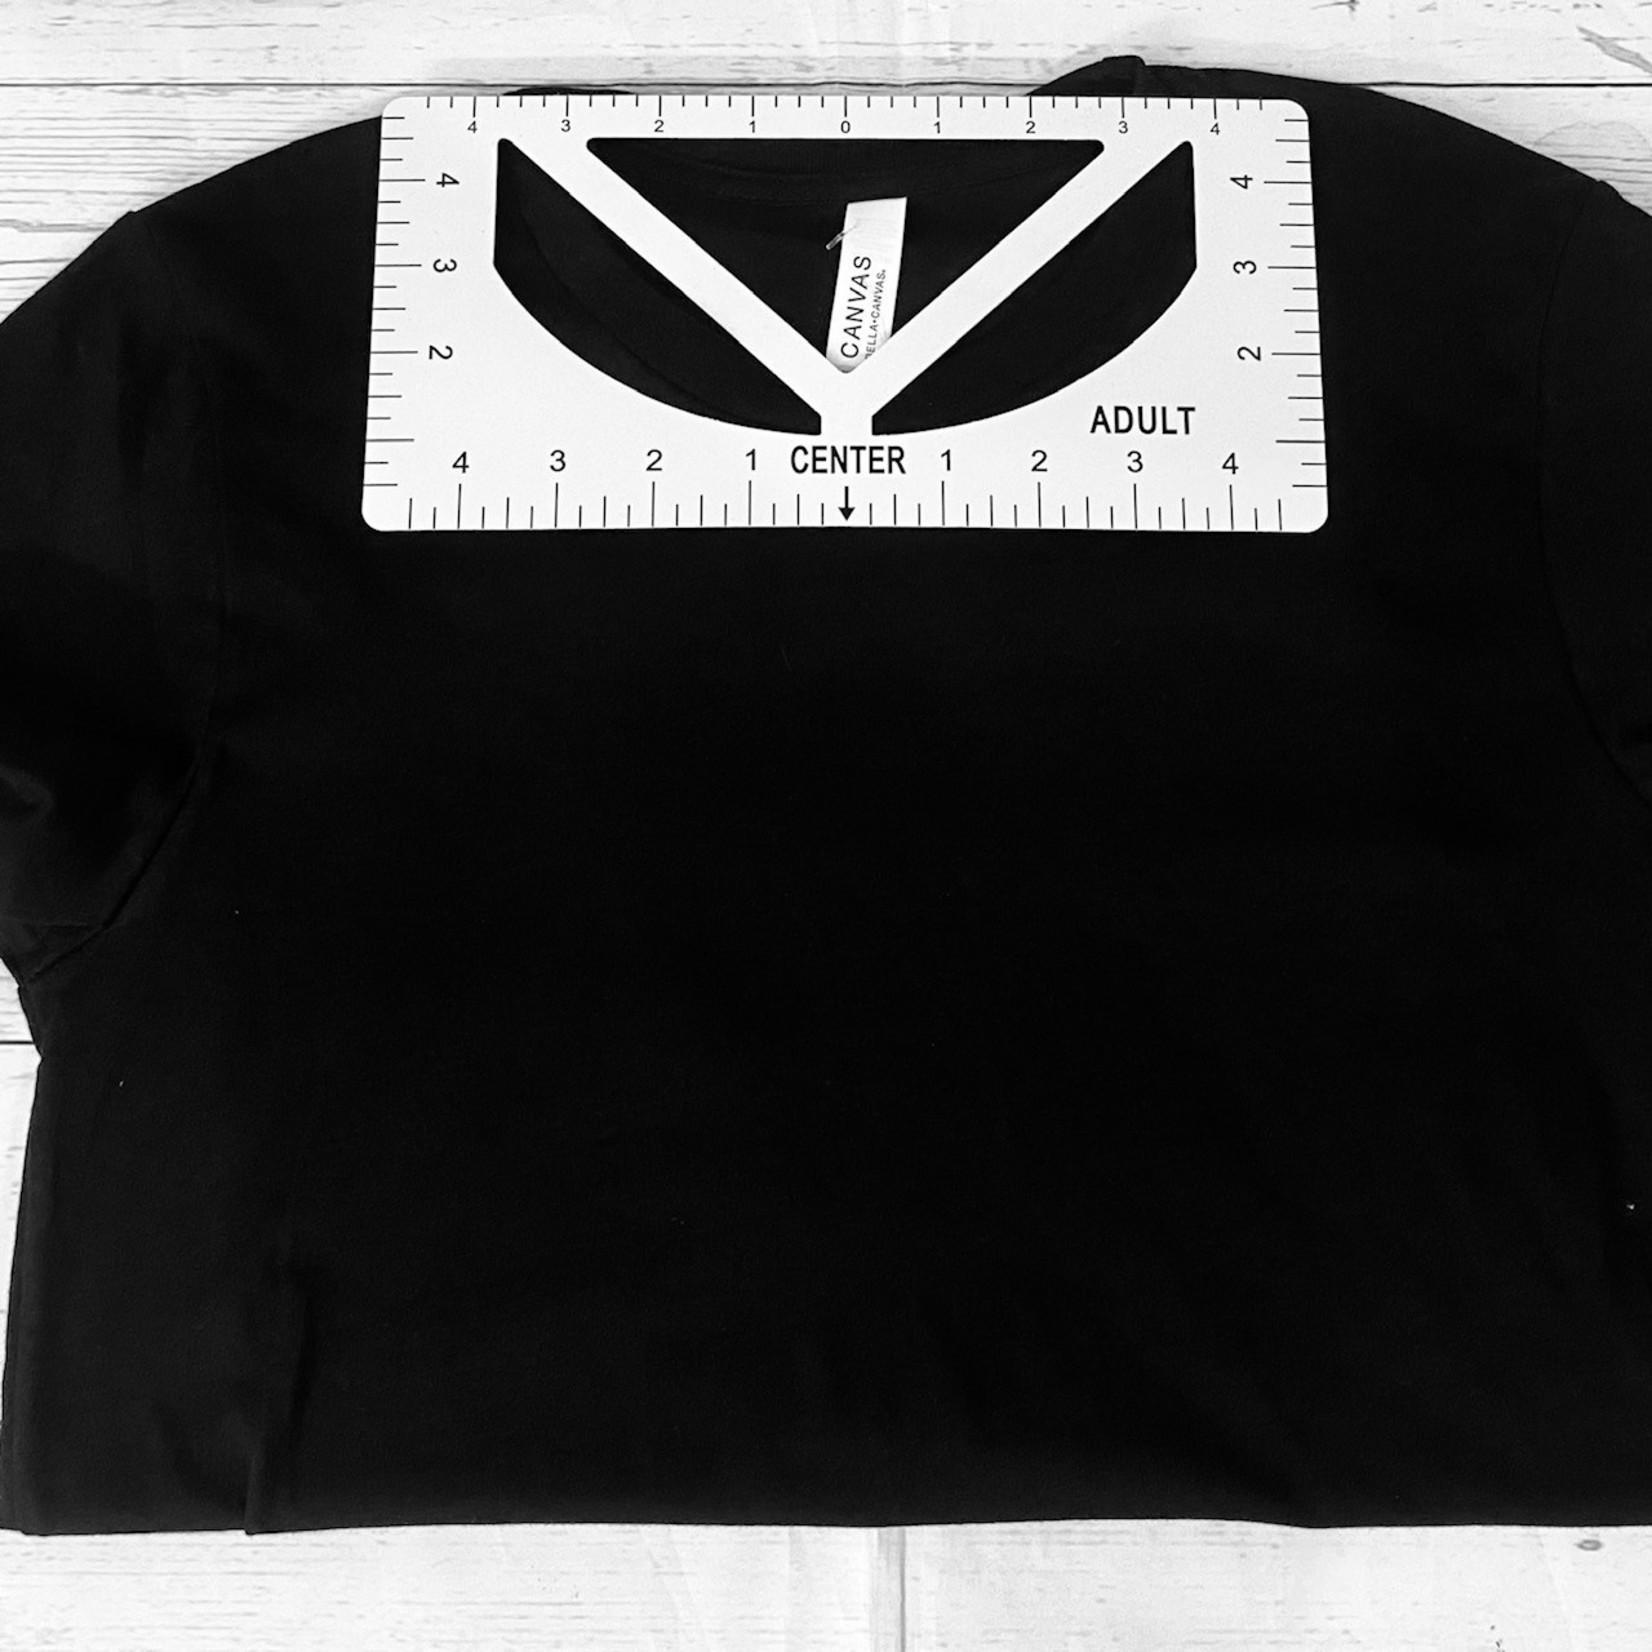 T-Shirt Alignment Ruler (Set of 4)